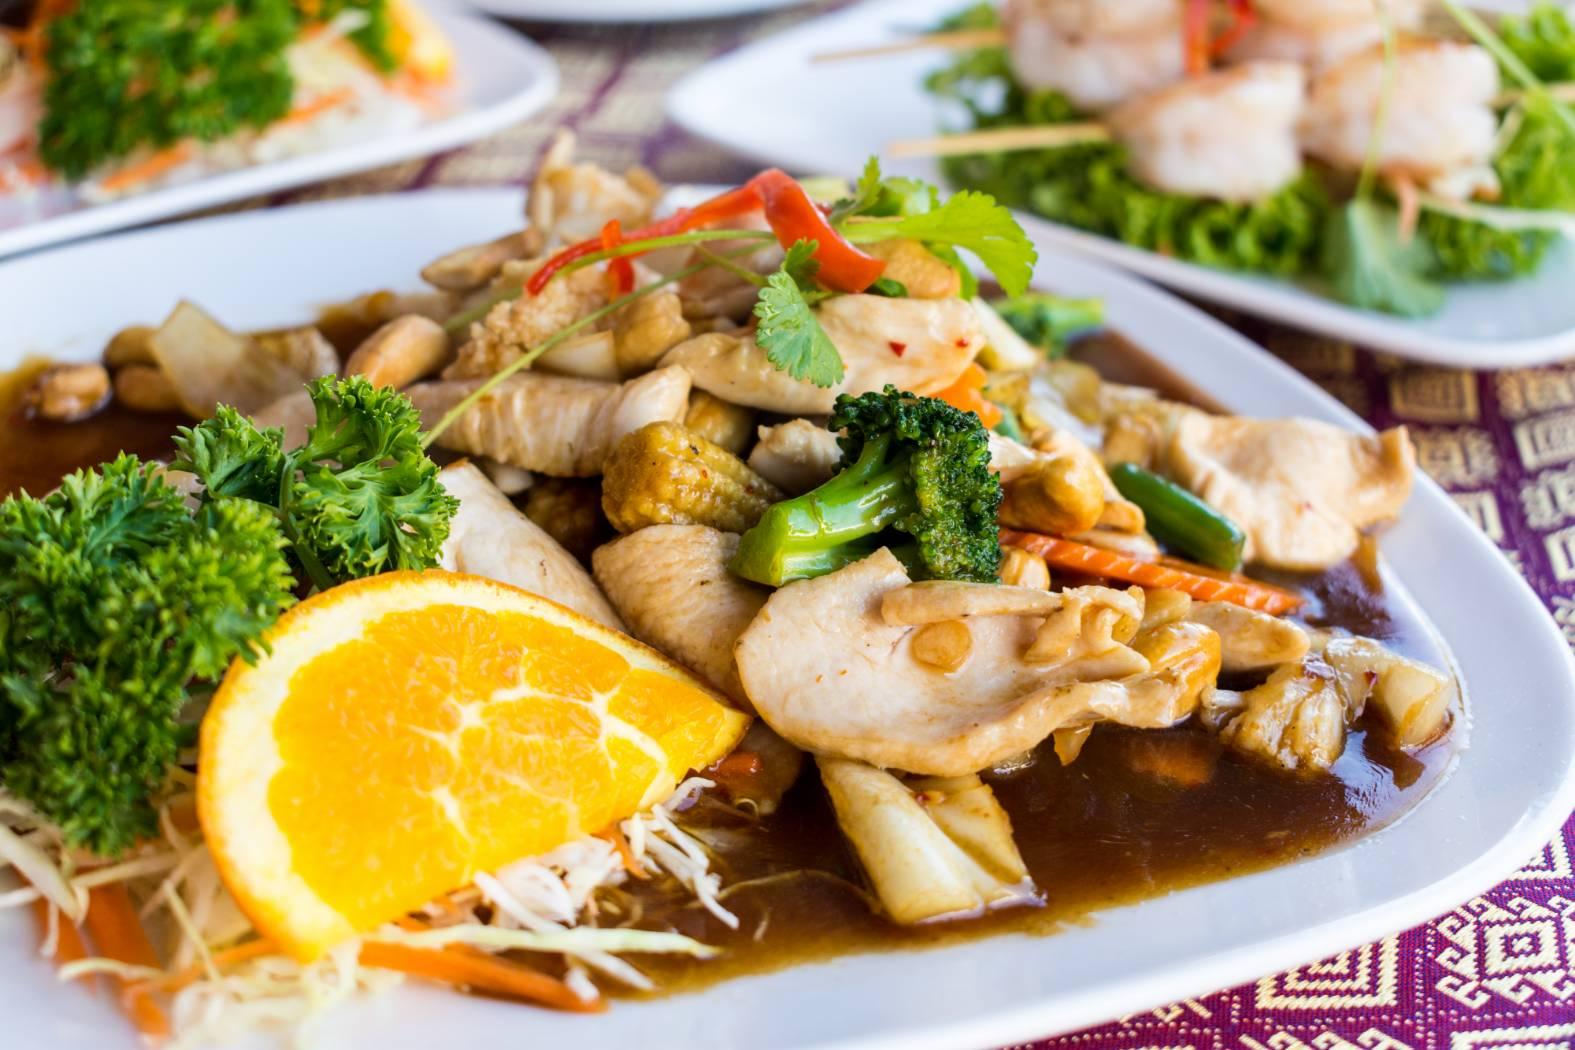 Thai%20thani%20restaurant%20tauranga%20%282%29_1575x1050